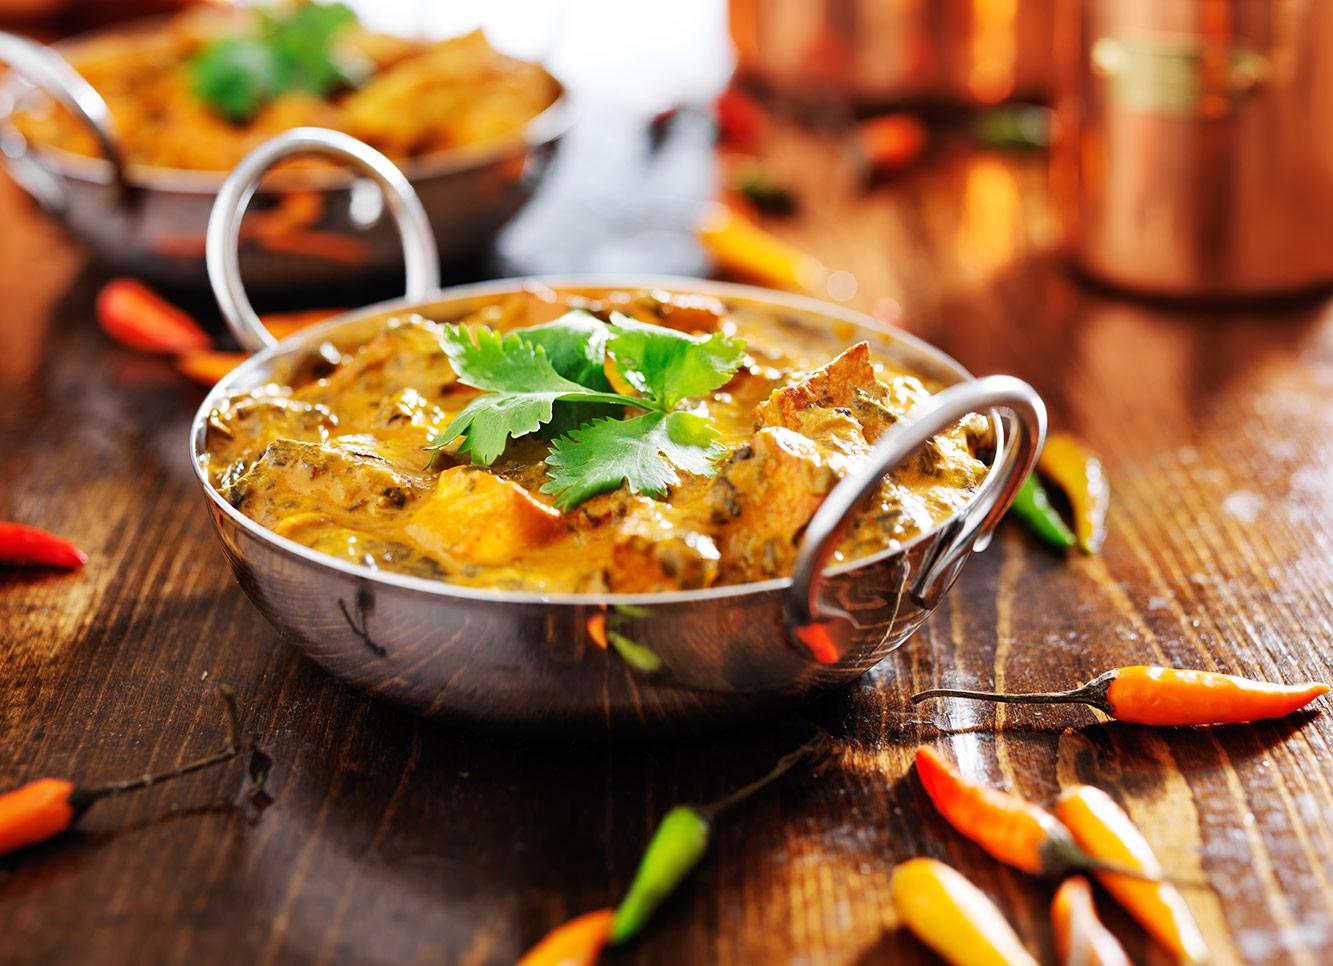 Food2 at Chutneys Indian Restaurant NE16